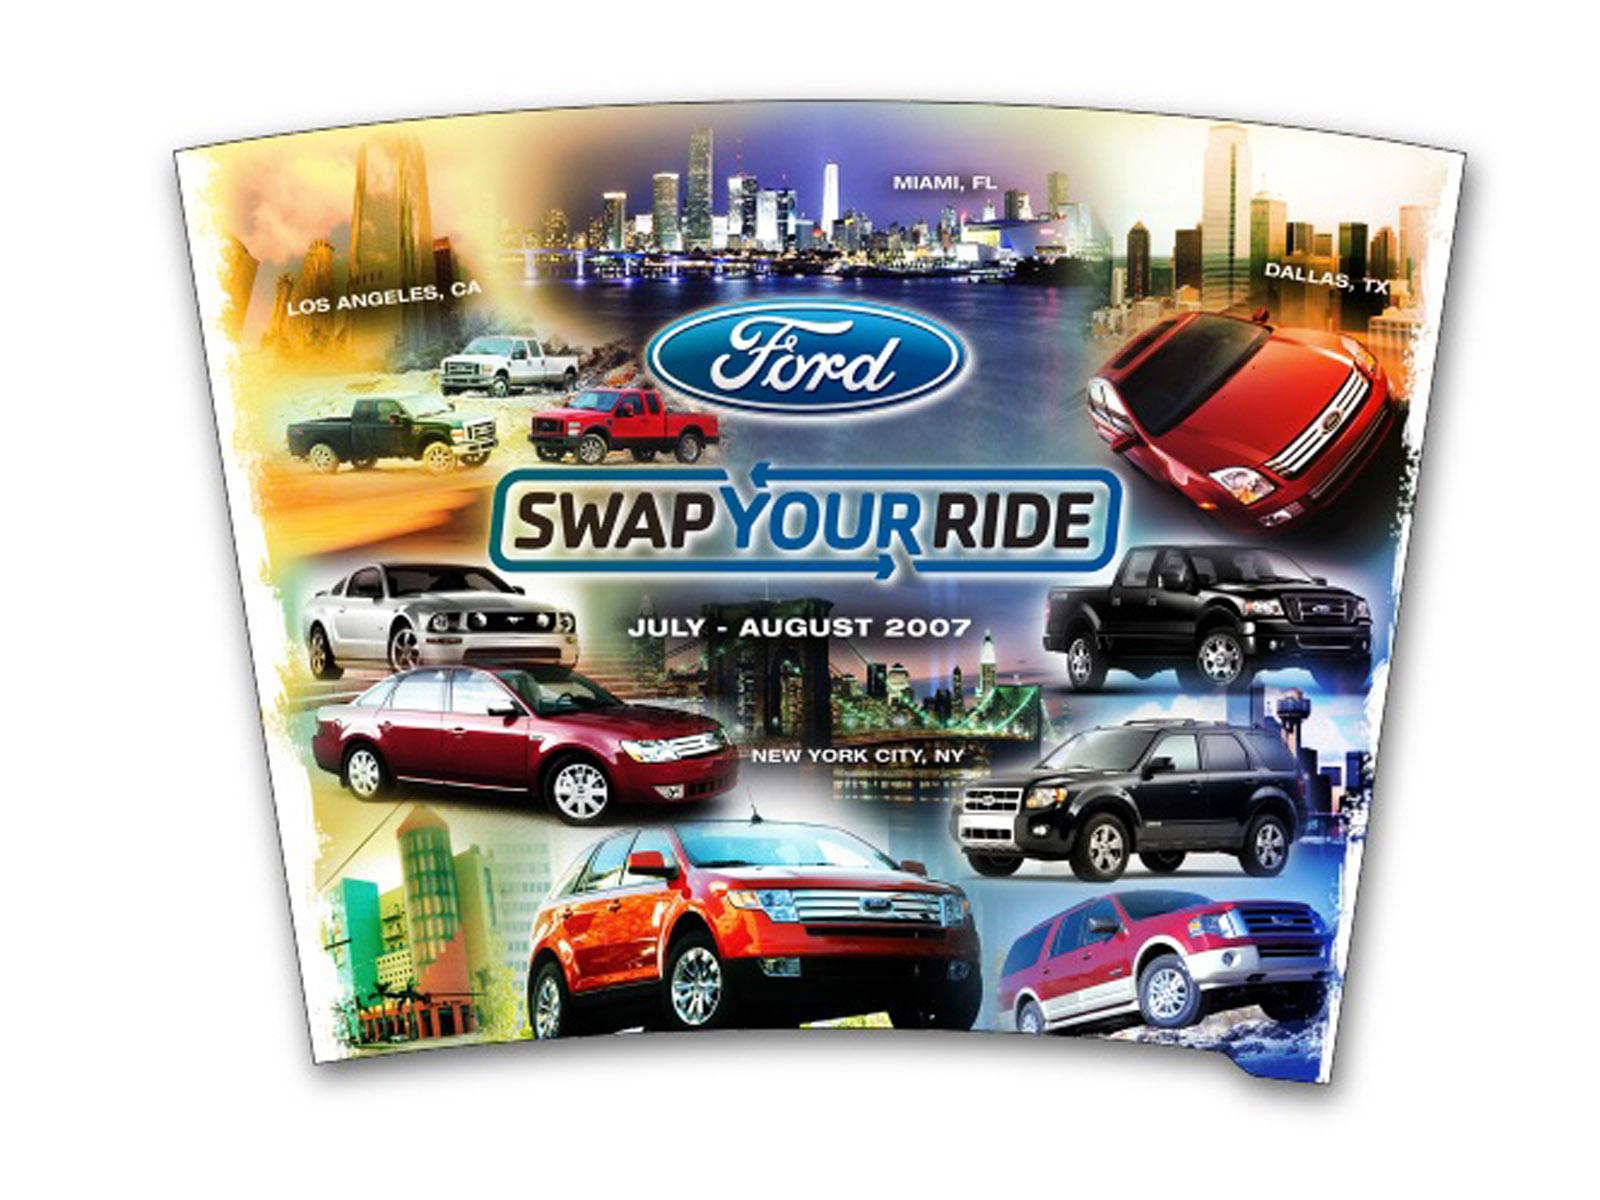 Swap Your Ride